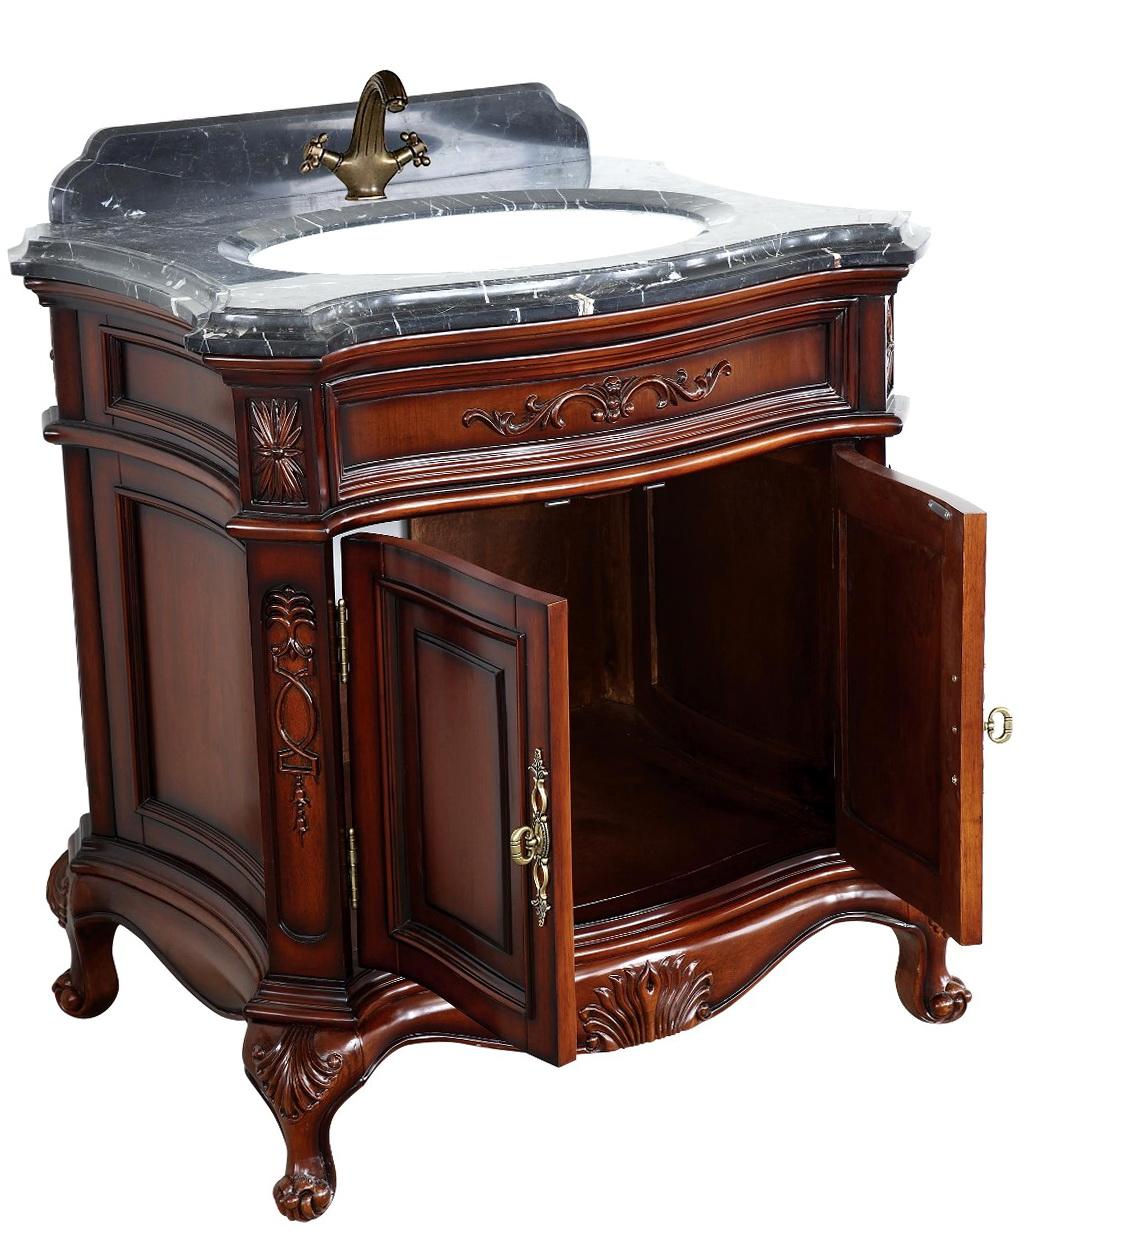 Antique Bathroom Vanity For Sale Home Design Ideas